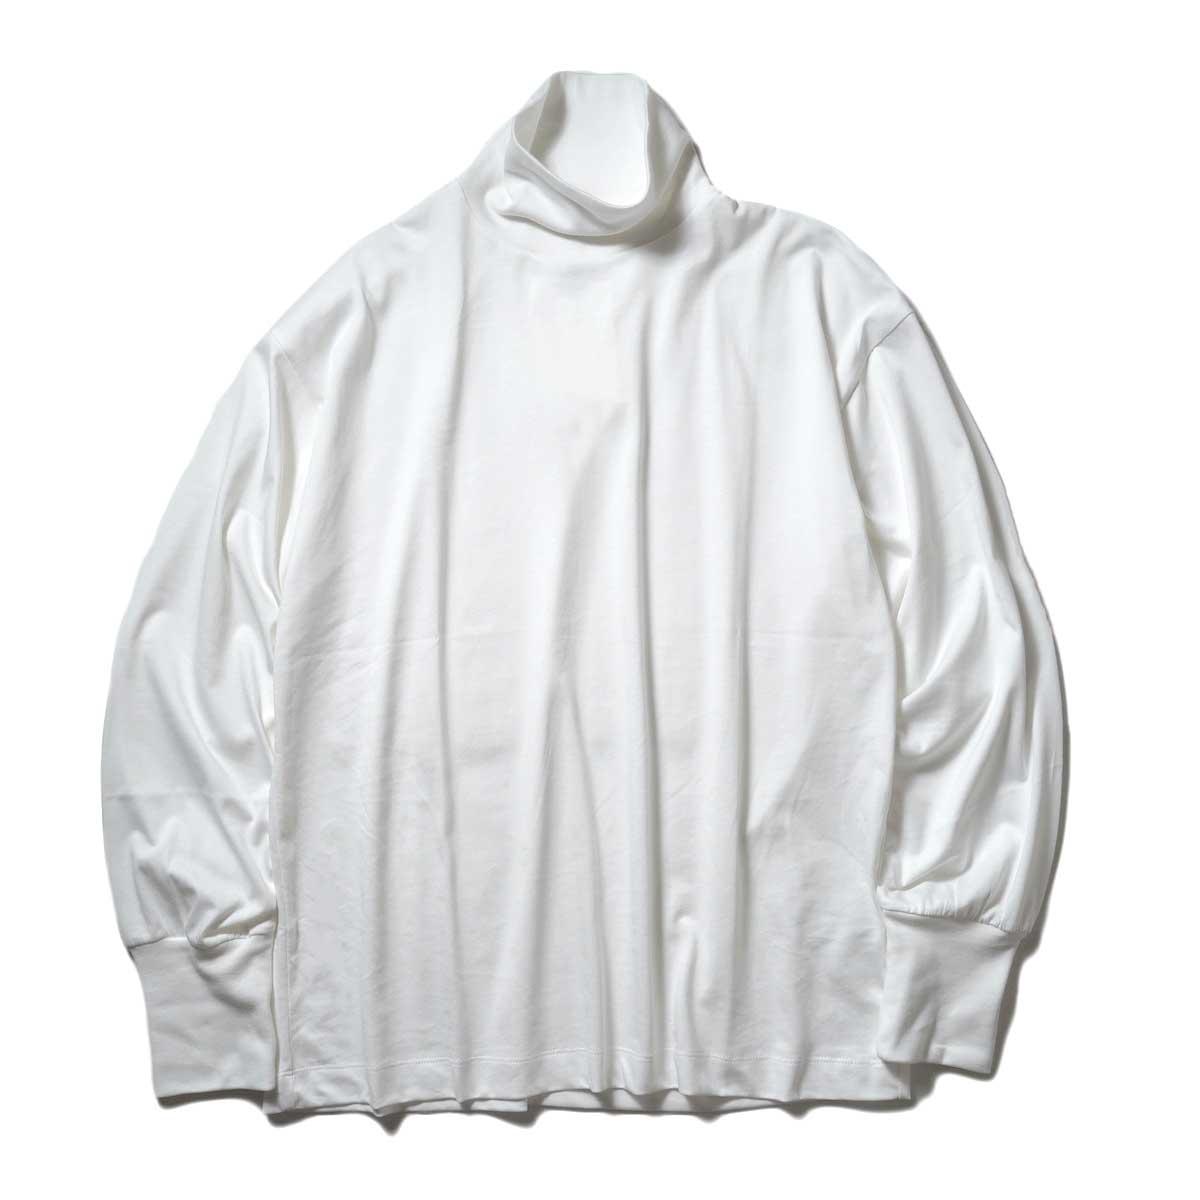 YLEVE / SOFT ORGANIC COTTON TURTLE (White)